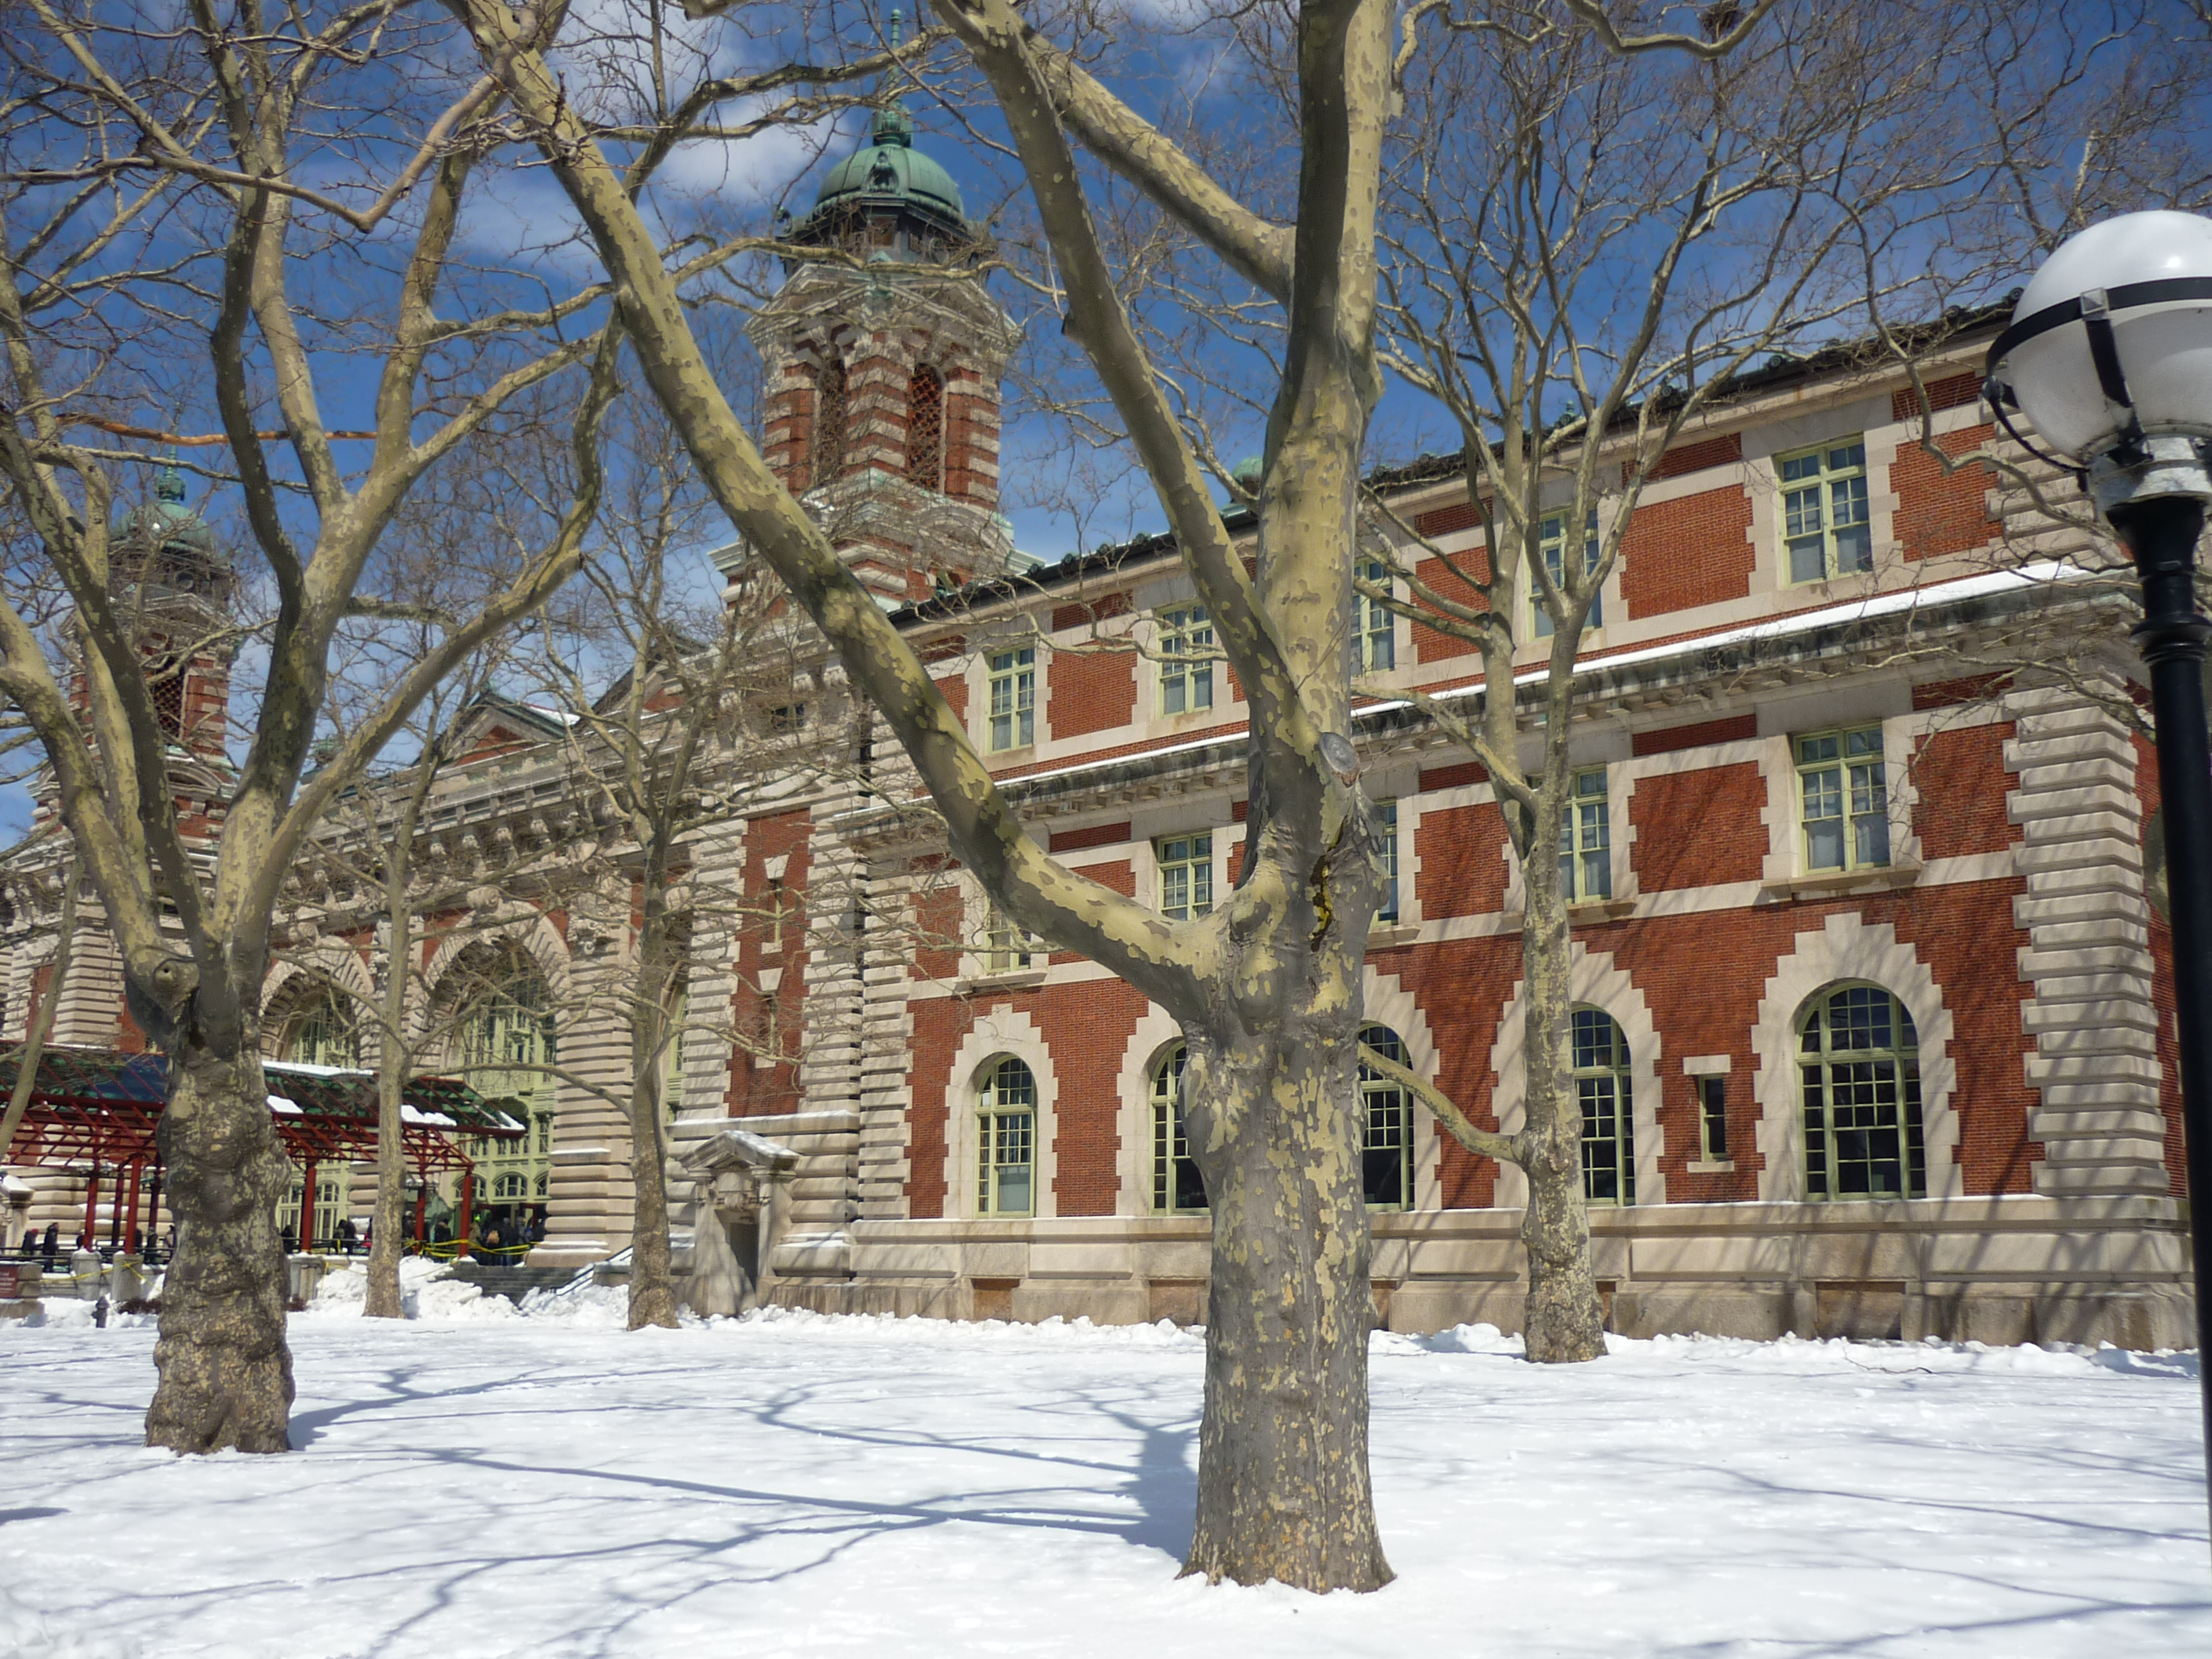 Entrance to main Ellis Island Building Entrance to main Ellis Island Building New York